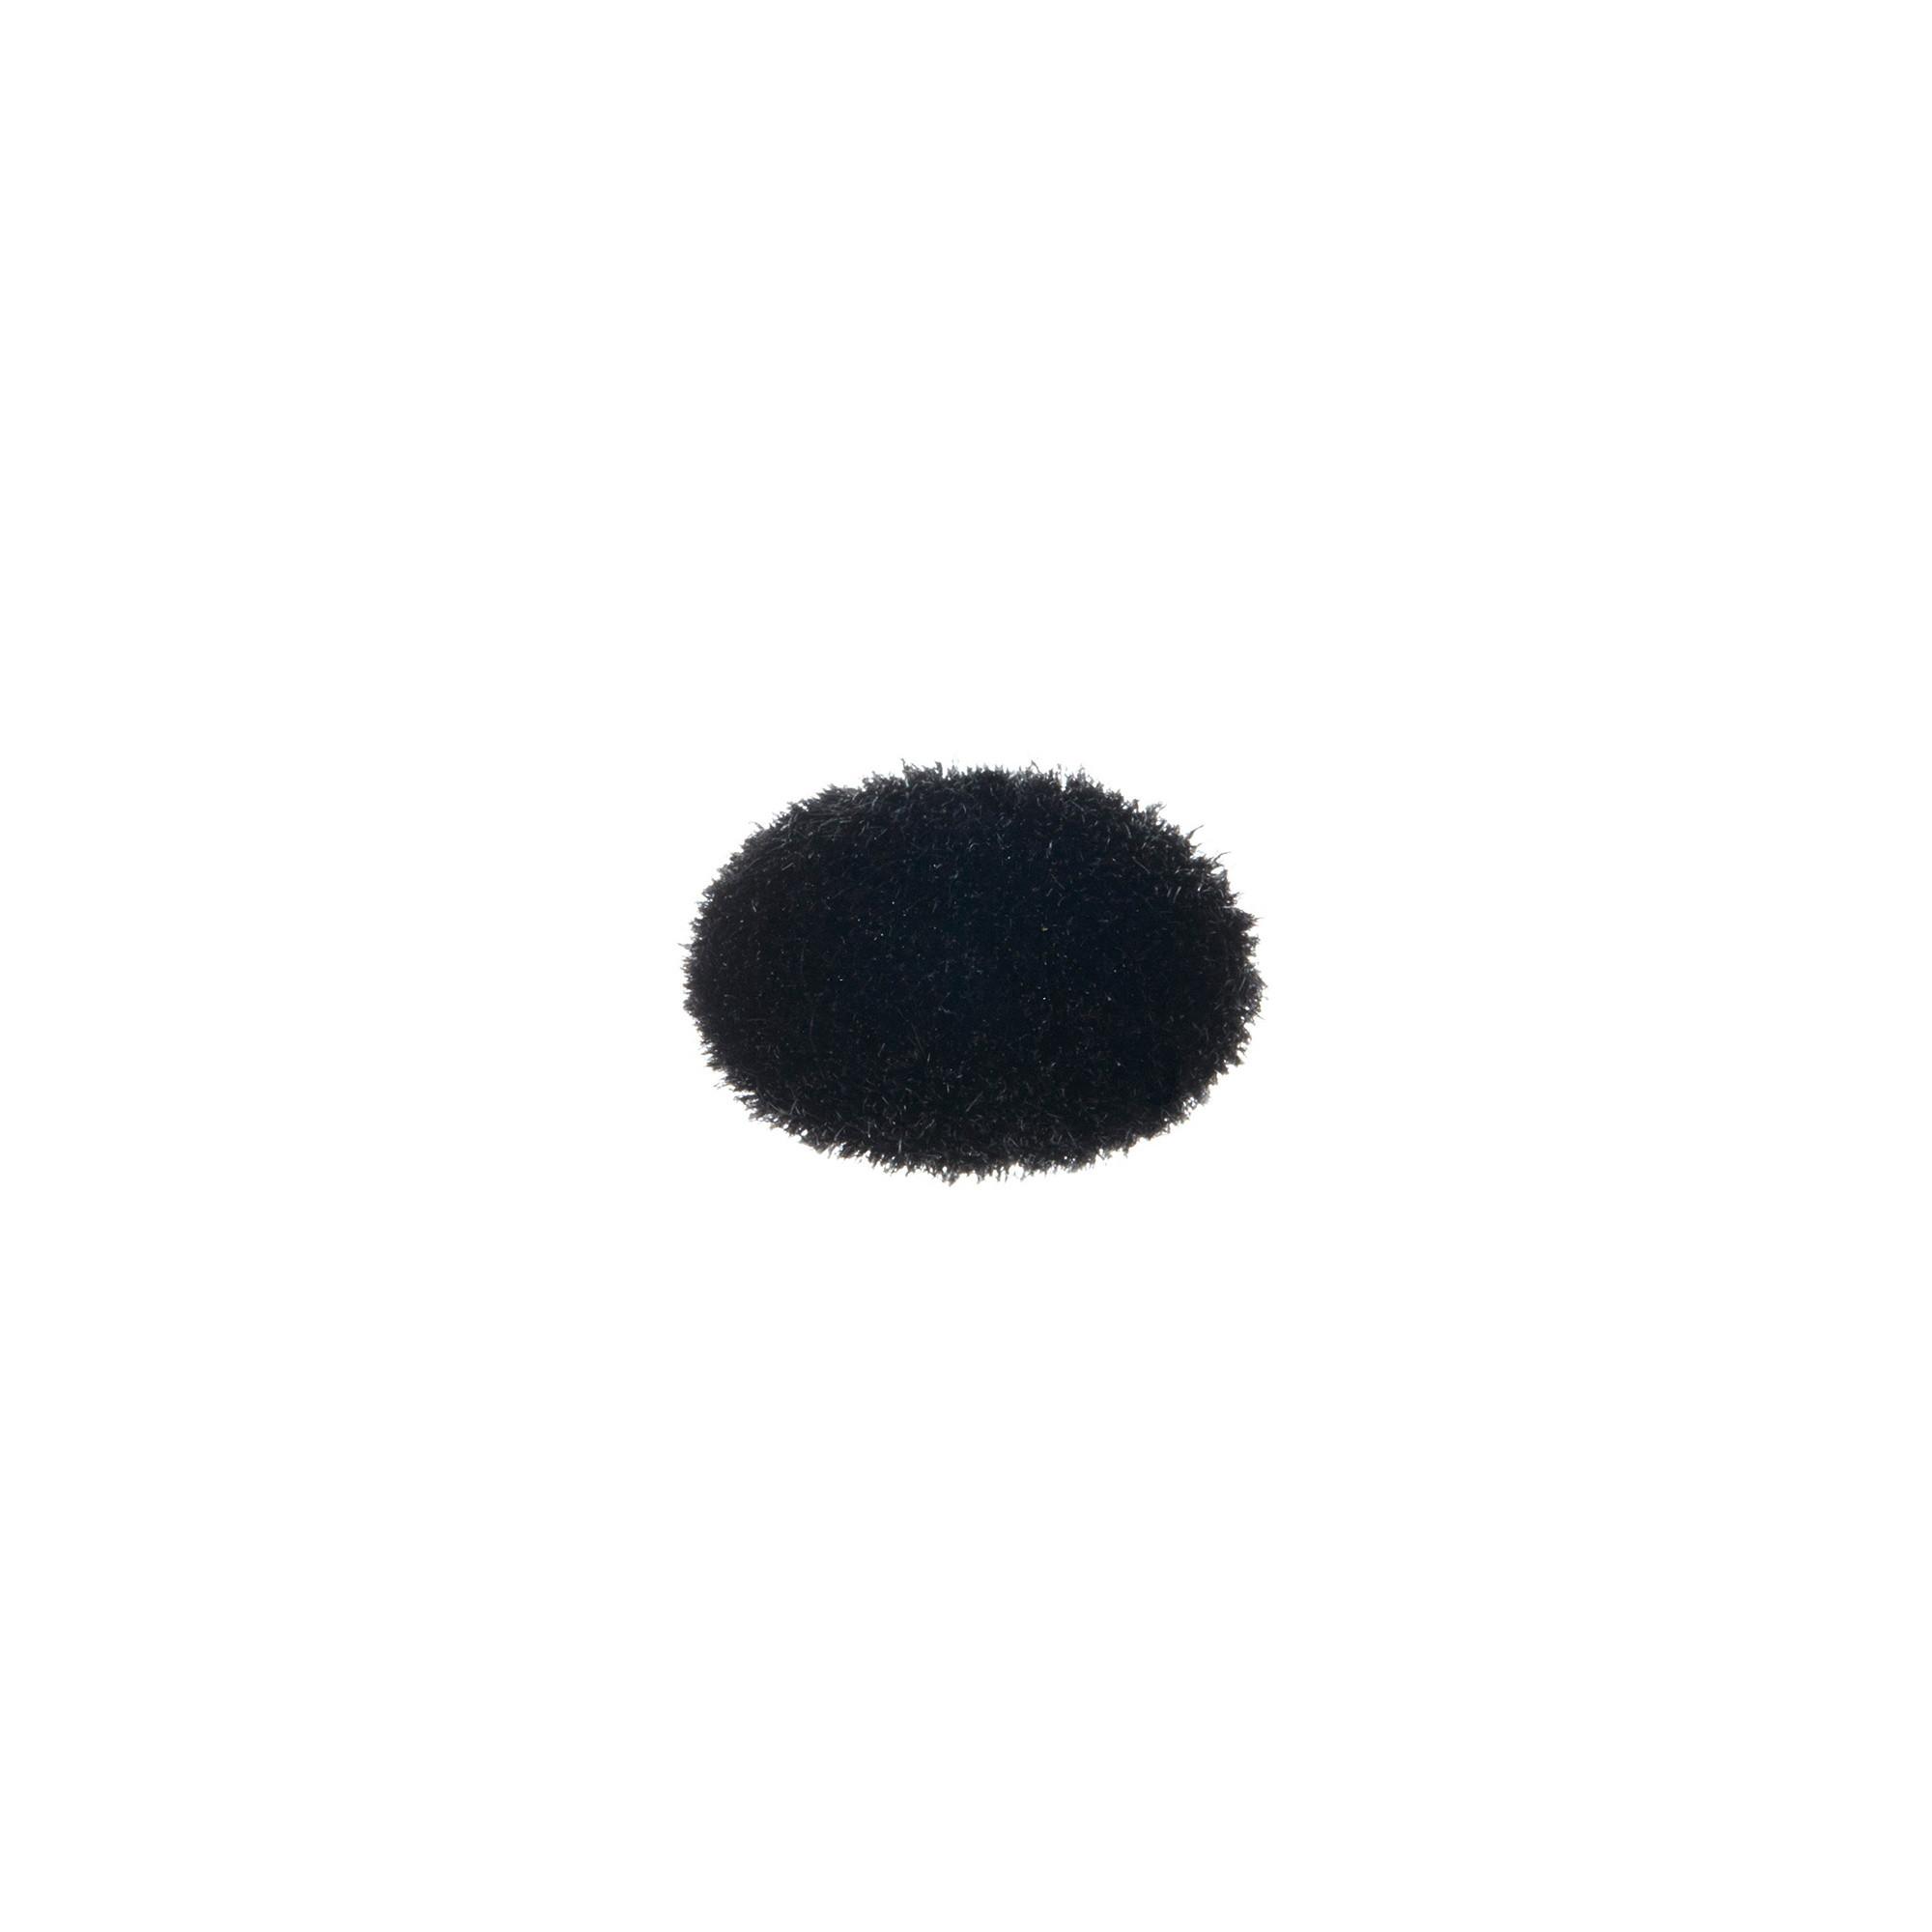 Brush - 129Shs Powder/Blush, Nero, large image number 2